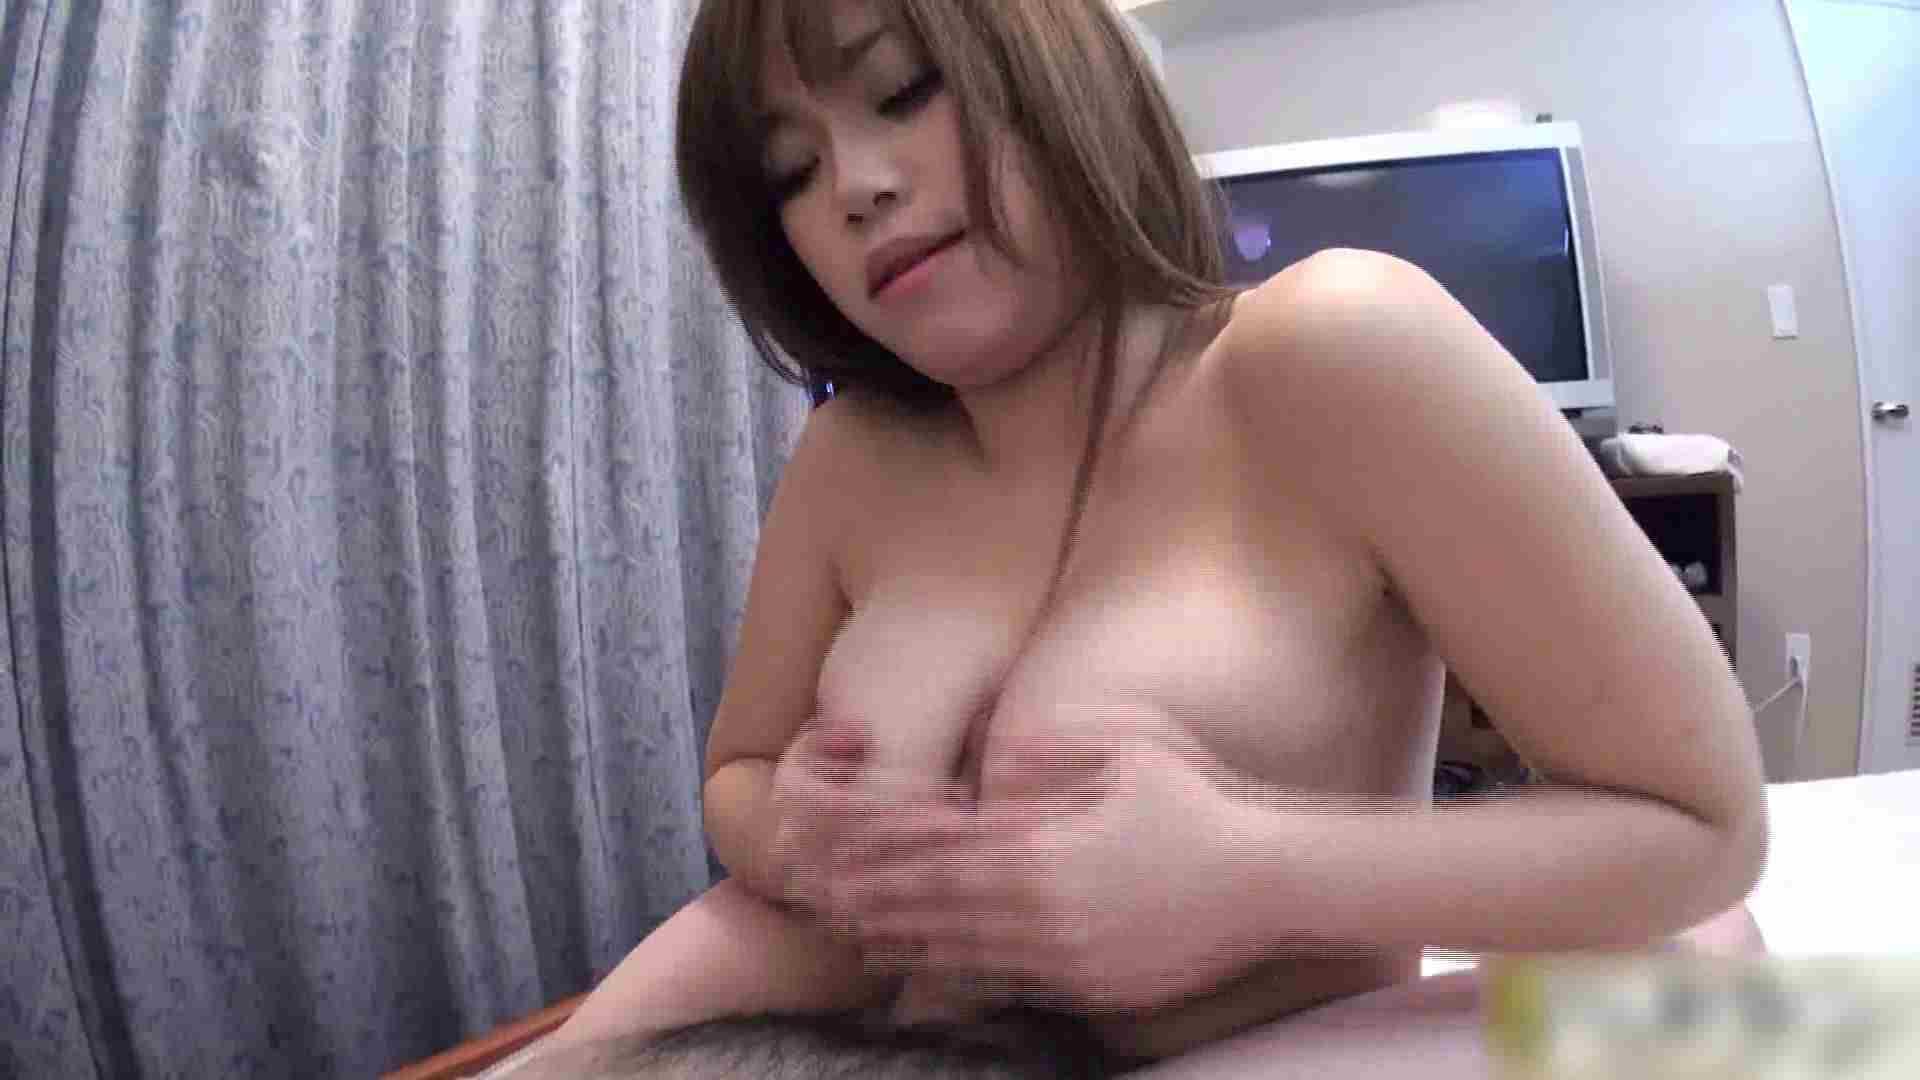 S級厳選美女ビッチガールVol.43 前編 美女  40連発 6